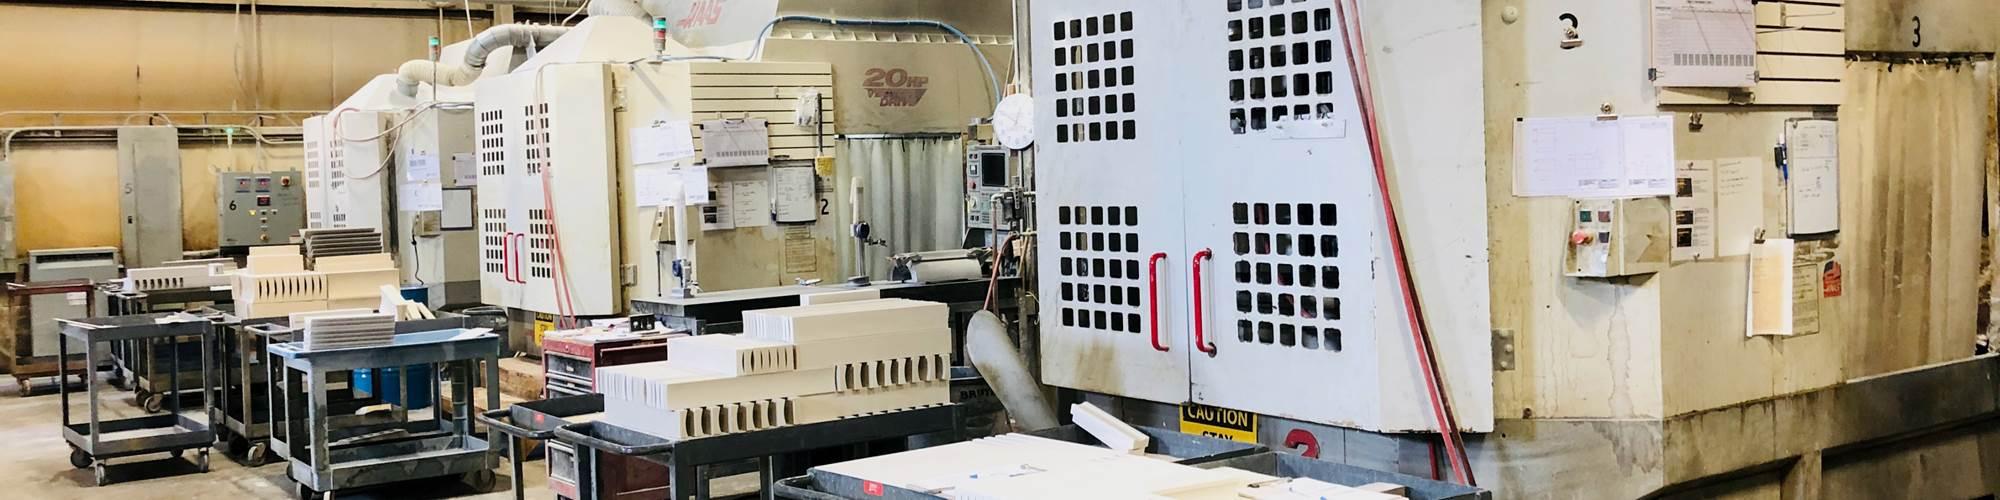 machines at Valtech